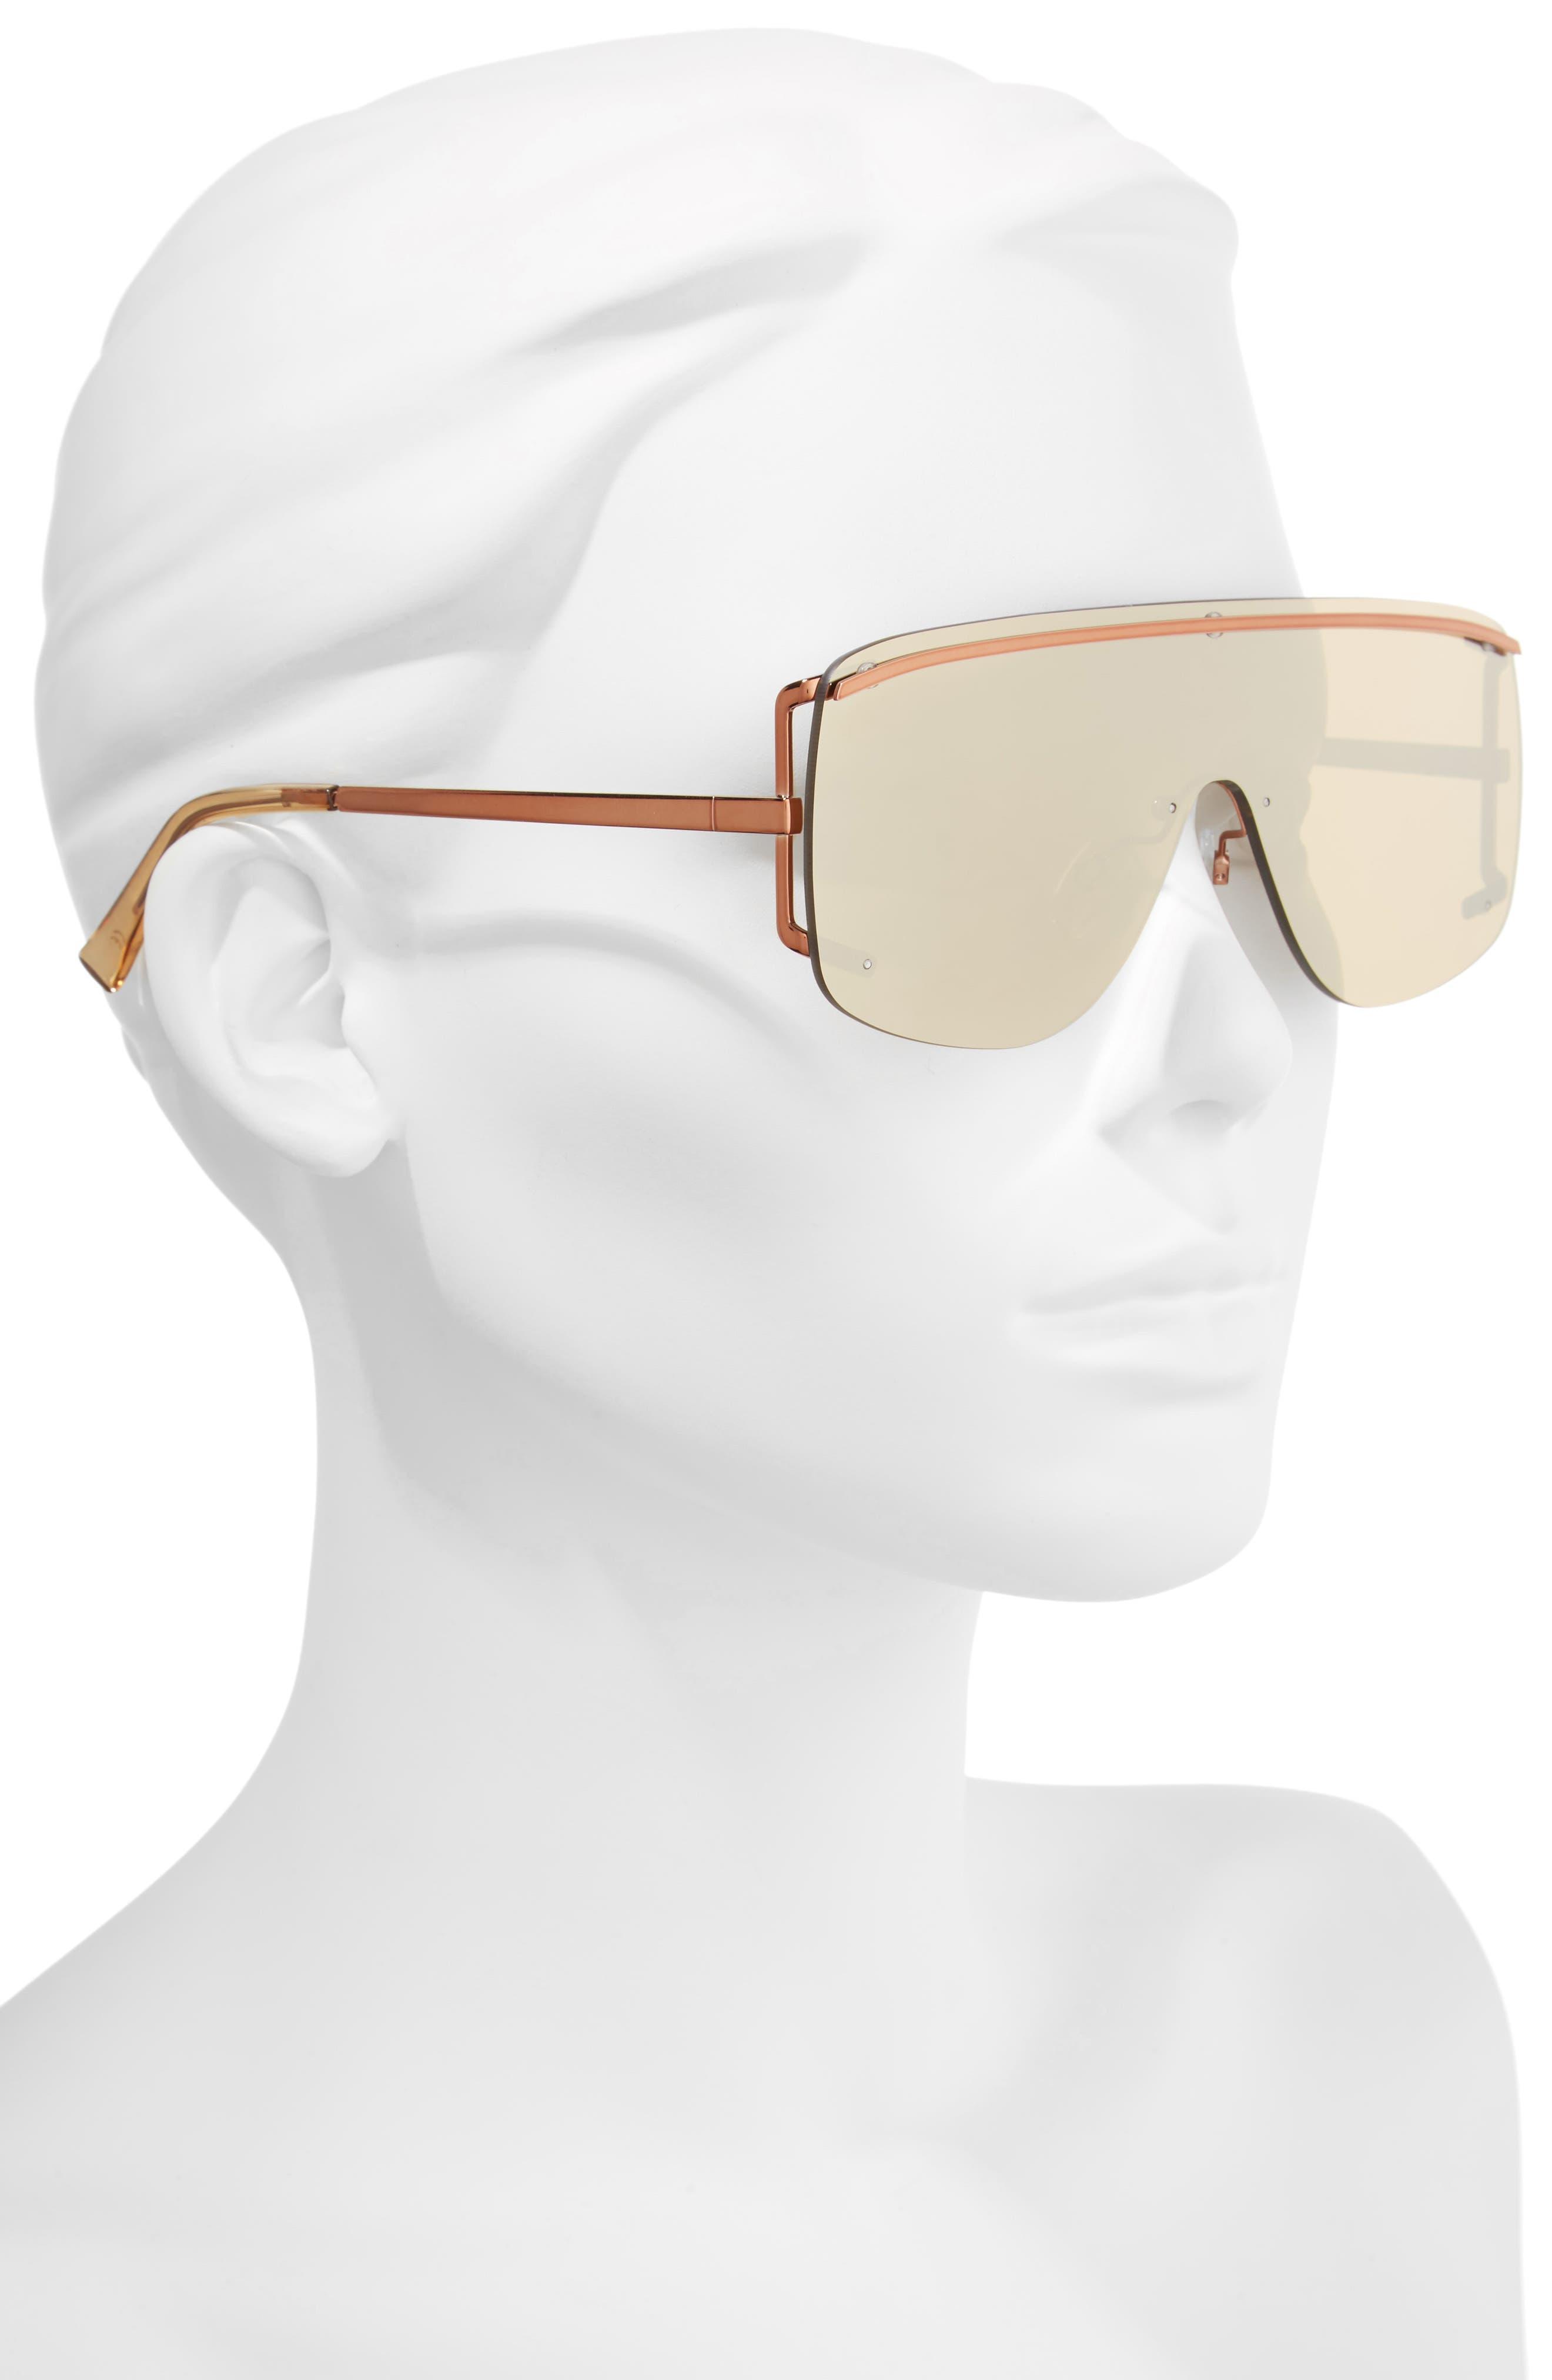 Elysium 140mm Shield Sunglasses,                             Alternate thumbnail 2, color,                             COPPER